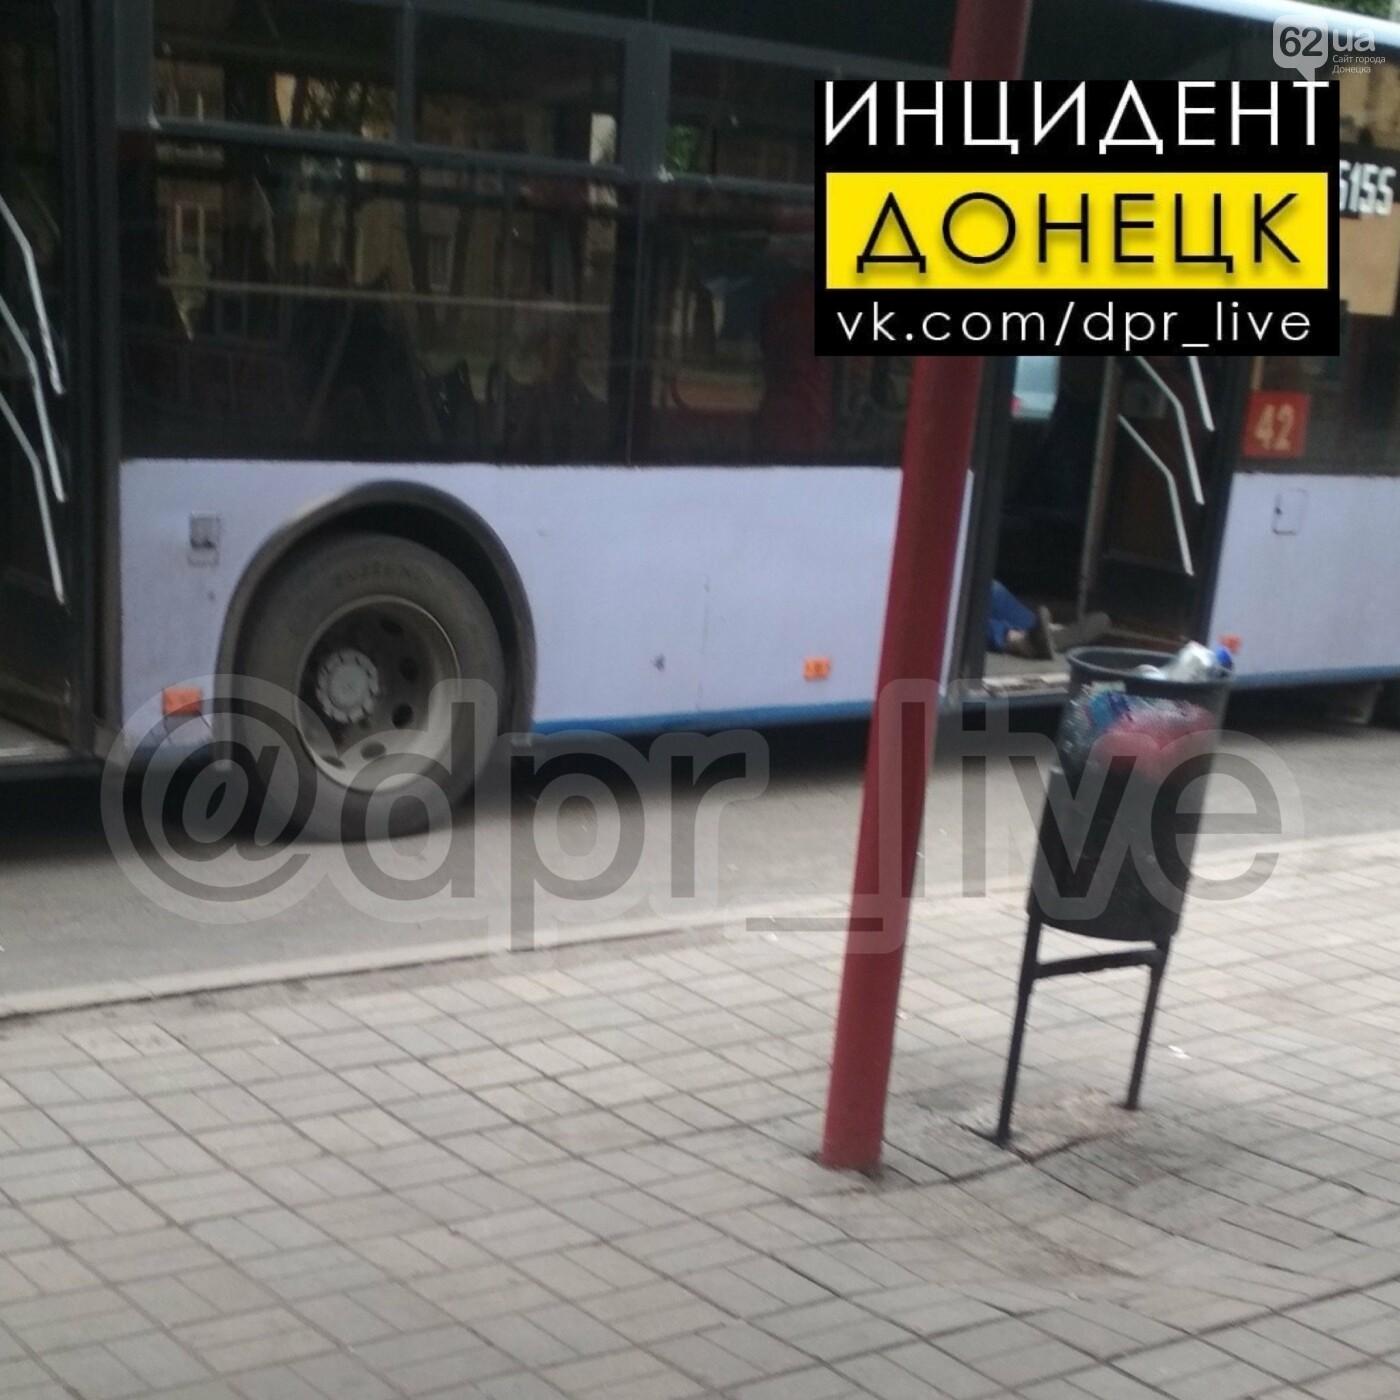 В Донецке, находясь за рулем, умер водитель автобуса, - ФОТО, фото-1